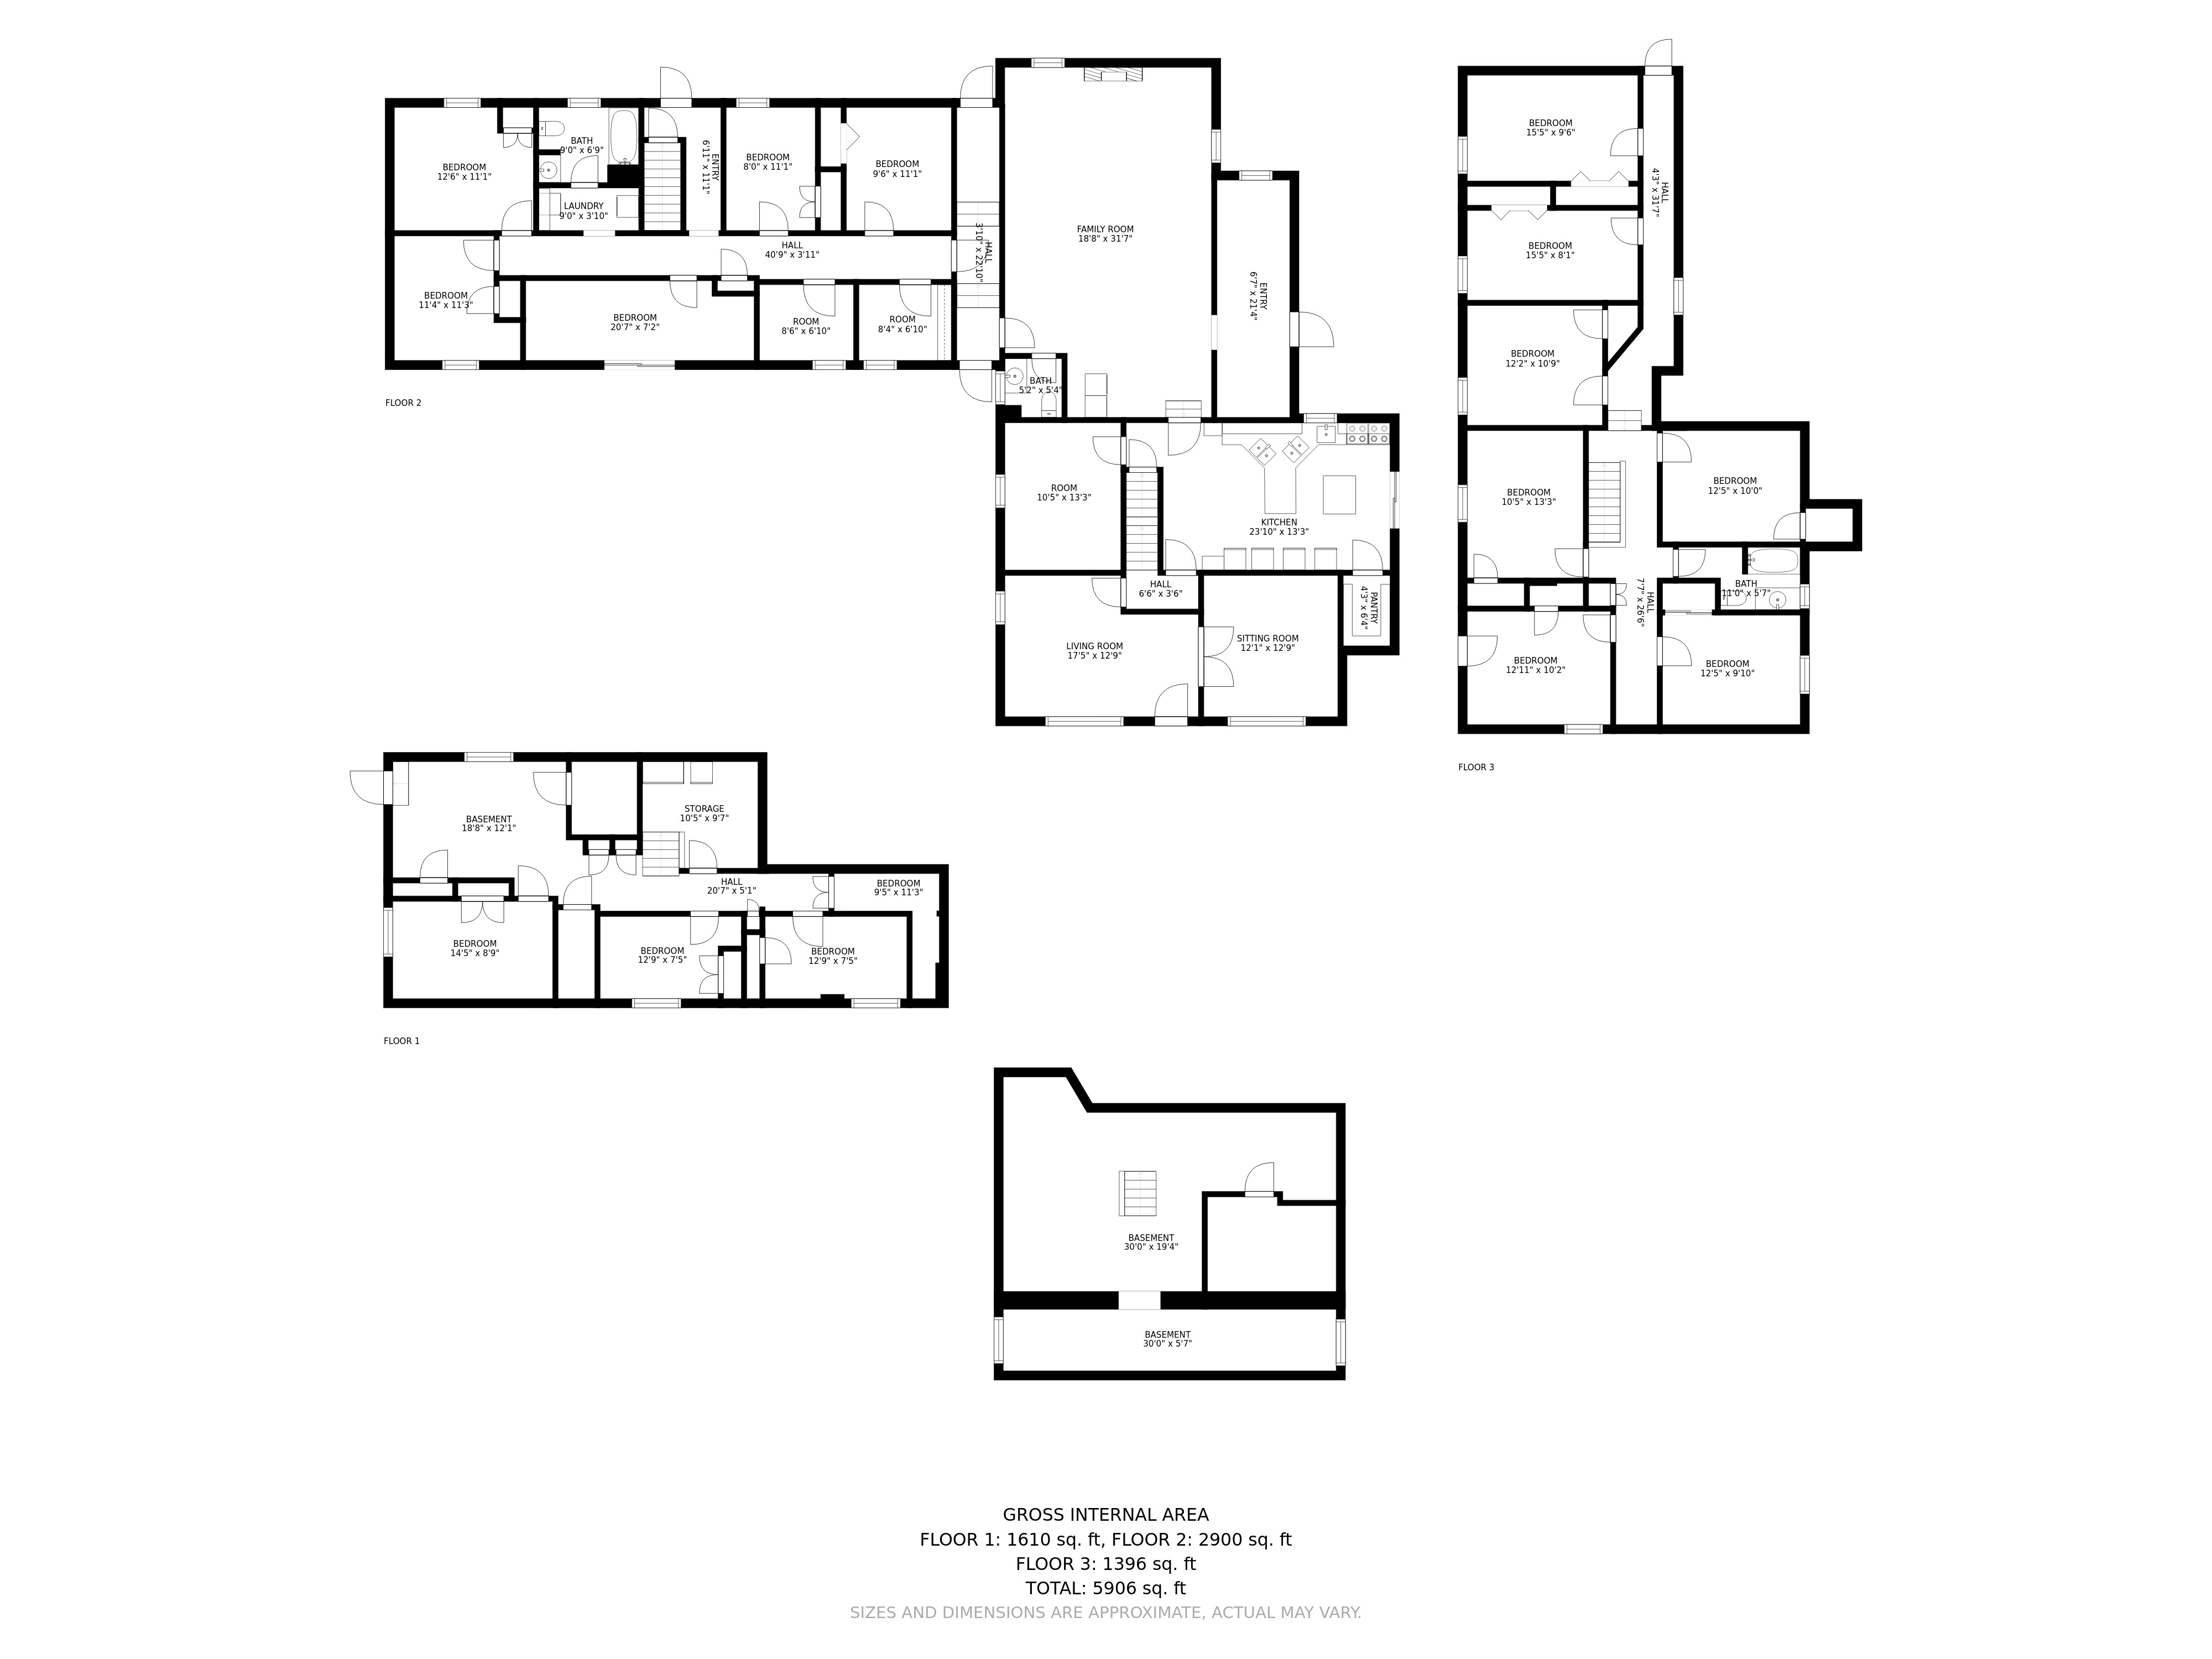 208 Newton Road floorplan